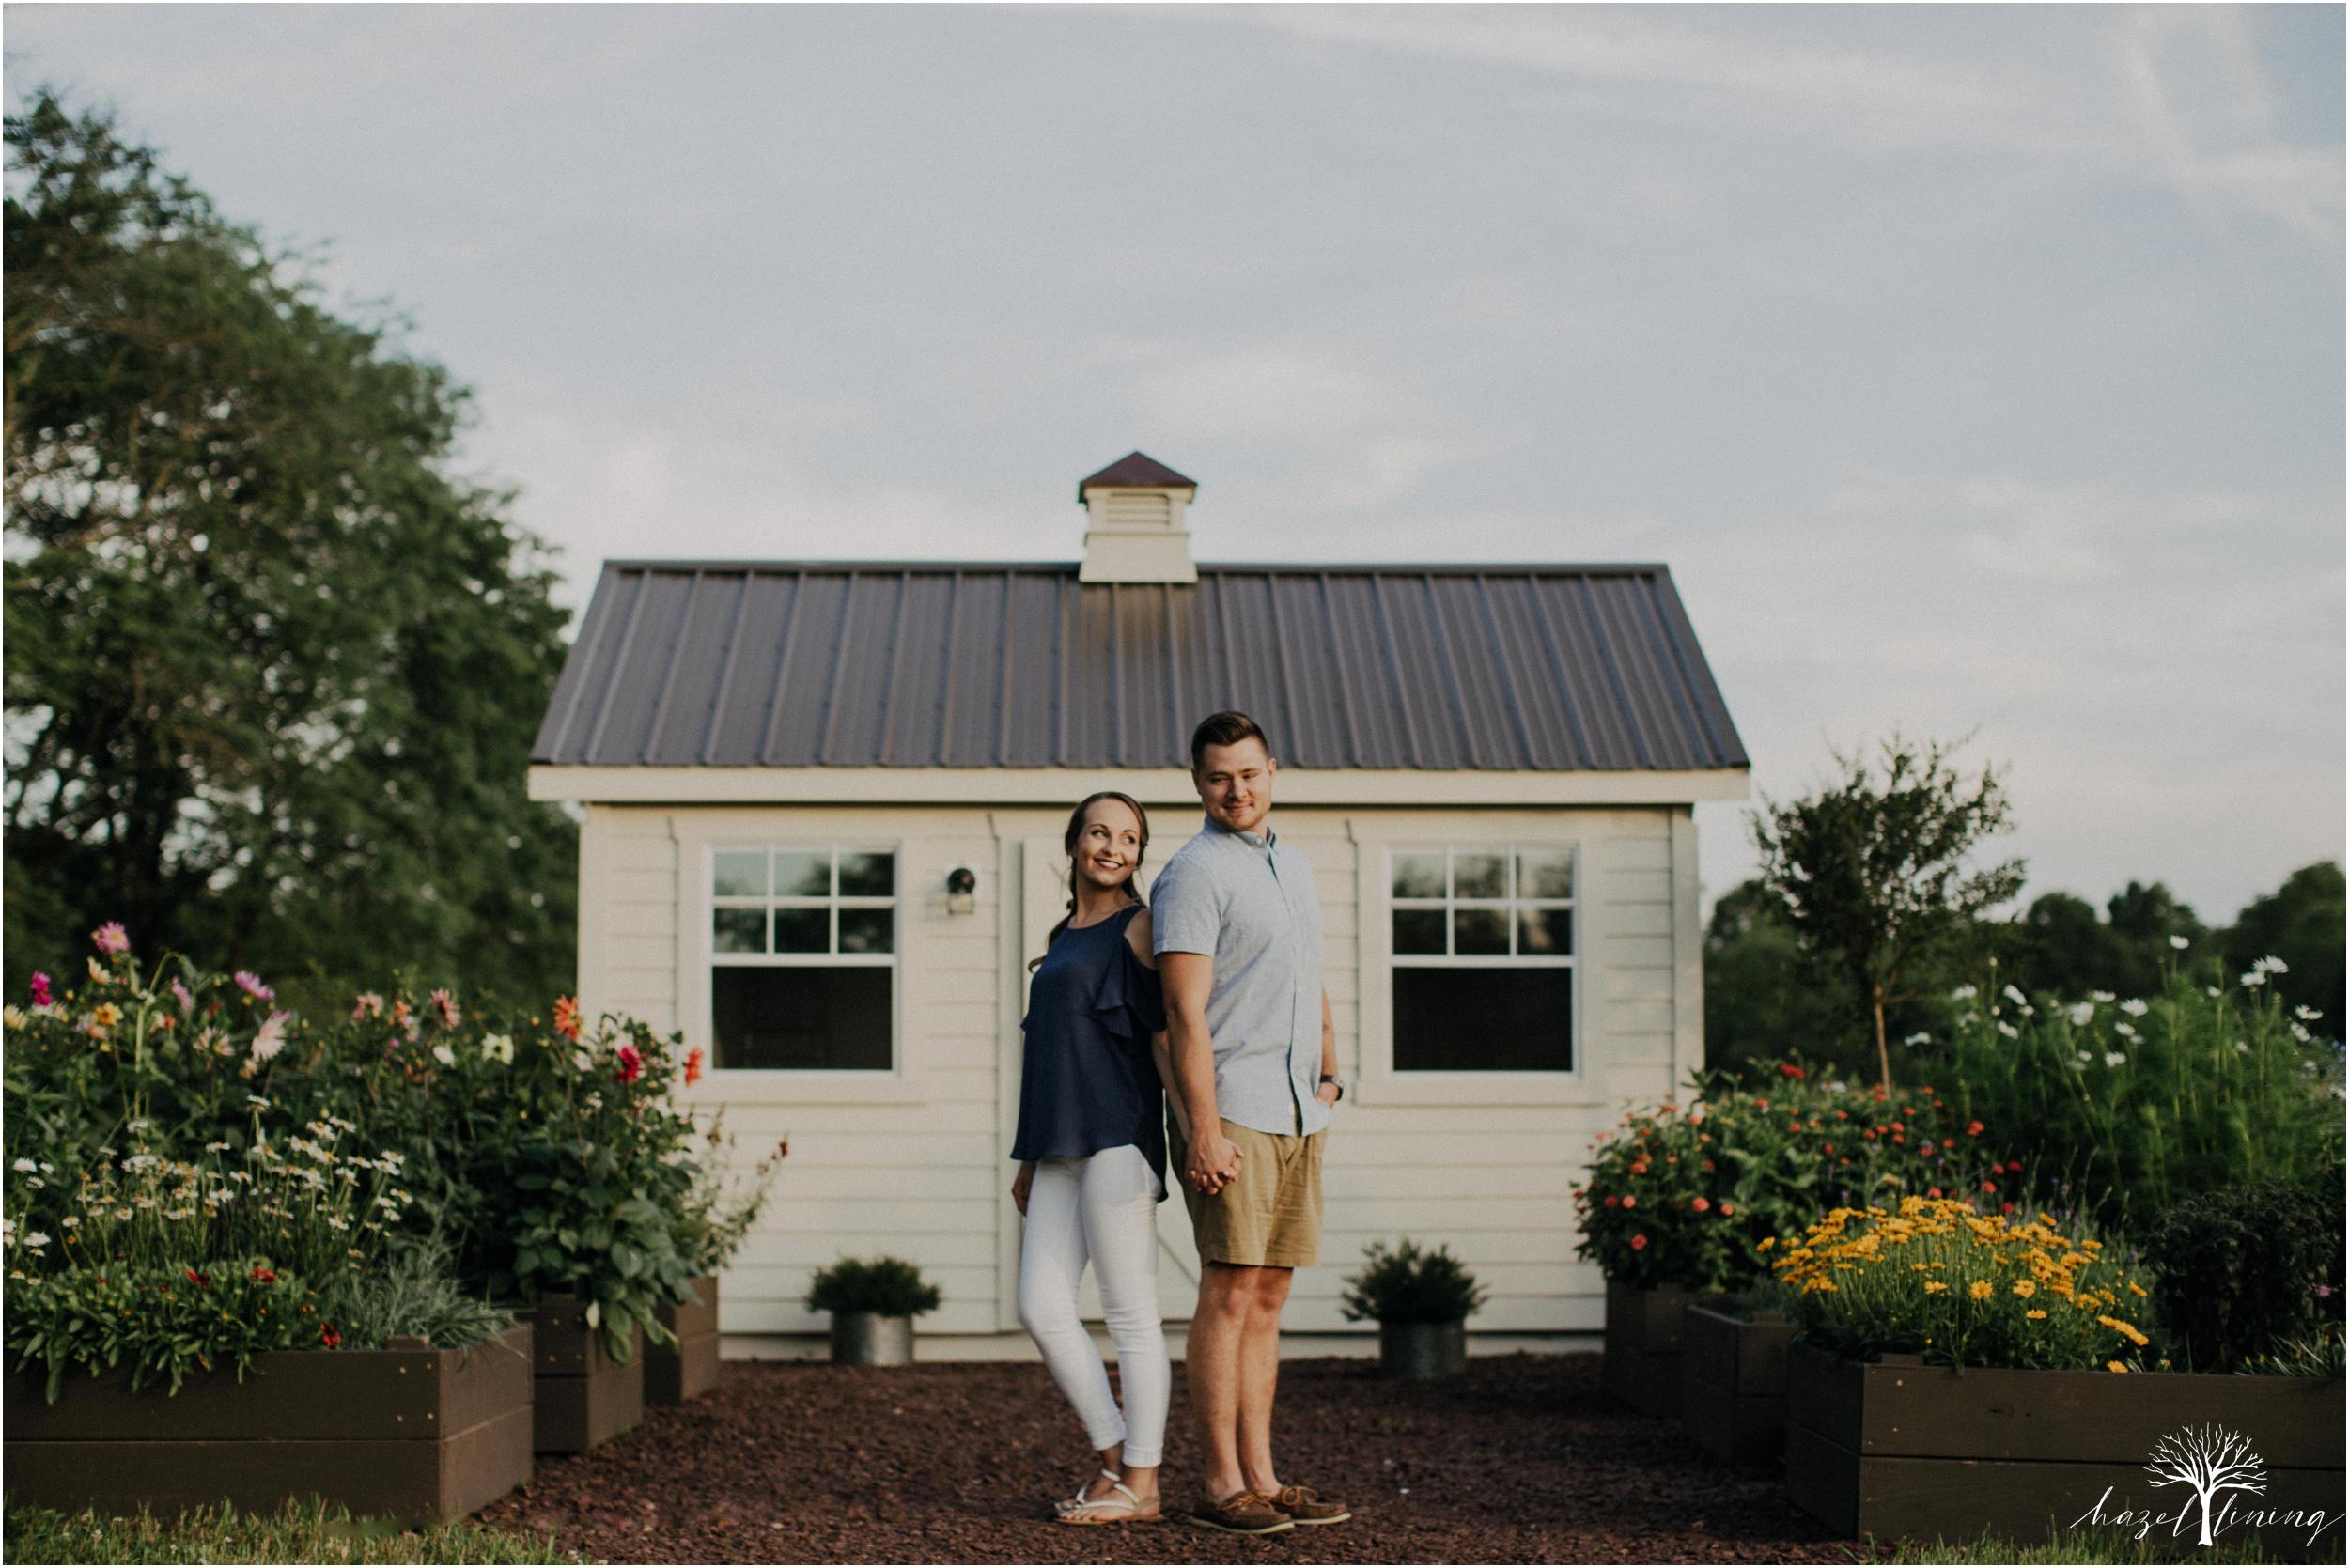 rachel-warner-chris-niedrist-the-farm-bakery-and-events-quakertown-pa-summer-engagement-hazel-lining-photography-destination-elopement-wedding-engagement-photography_0052.jpg